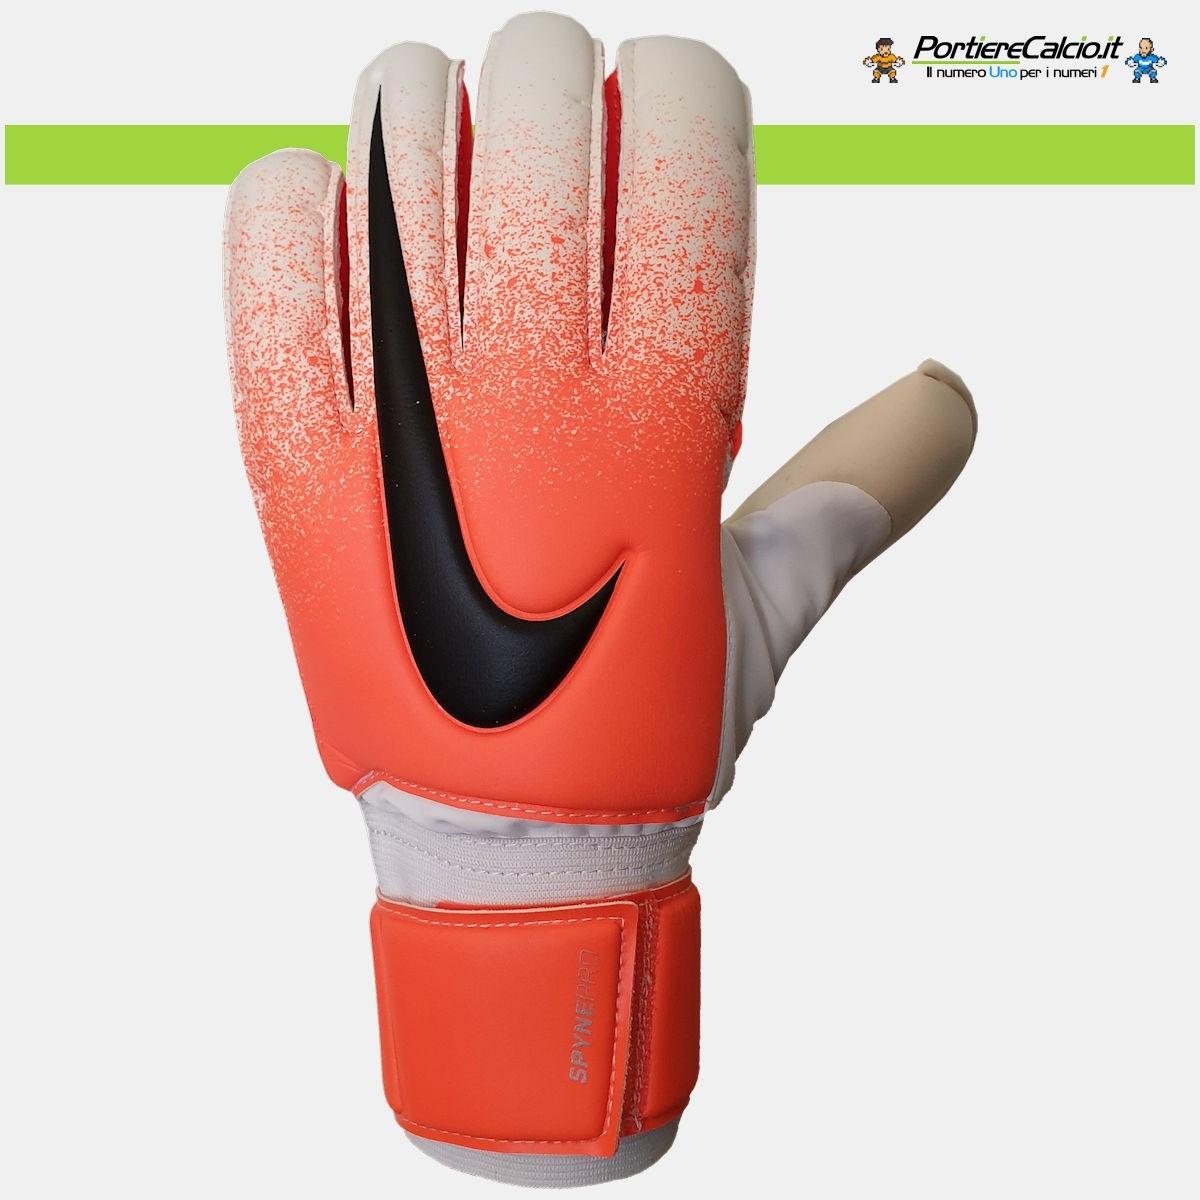 a980af0efb Guanti da portiere Nike Gk Spyne Pro bianco arancio dorso